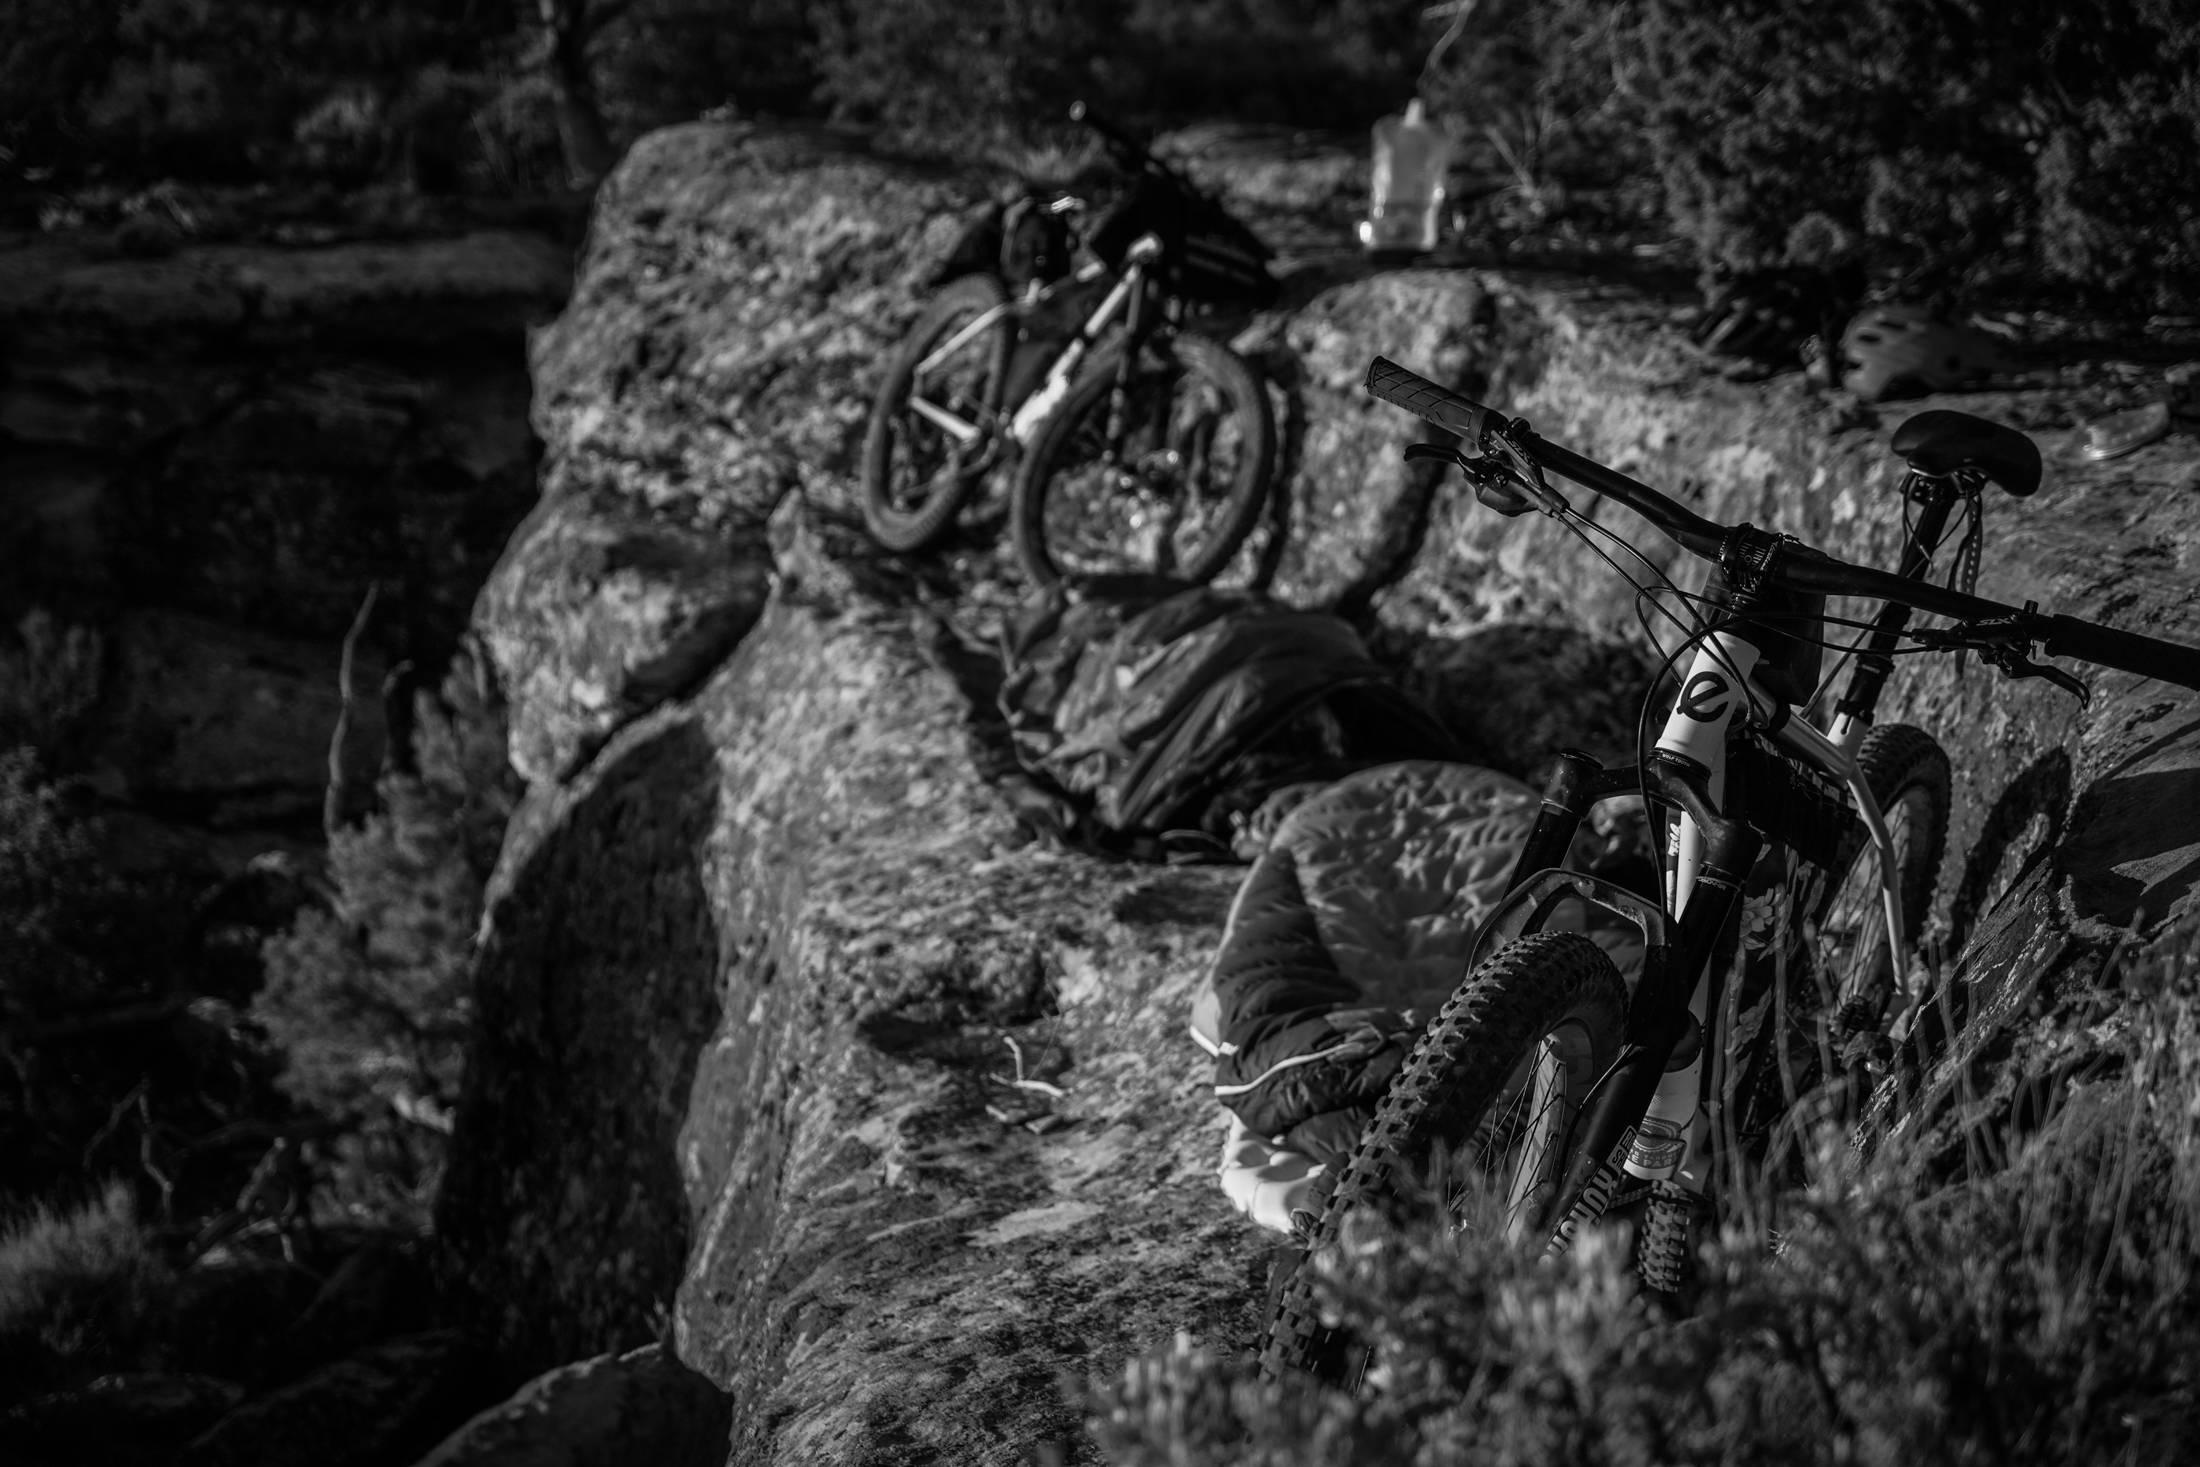 Mountain bike trails, mountain bike adventure, mtb, mtb trails, demo bike, demo mountain bike, mountain bike demo, ride mountain bike, mountain bike rides, bikepacking, bikepacking trail, bikepacking trip, montana bikepacking, singletrack, singletrack trails, singletrack mountain bike trails, mountain biking.